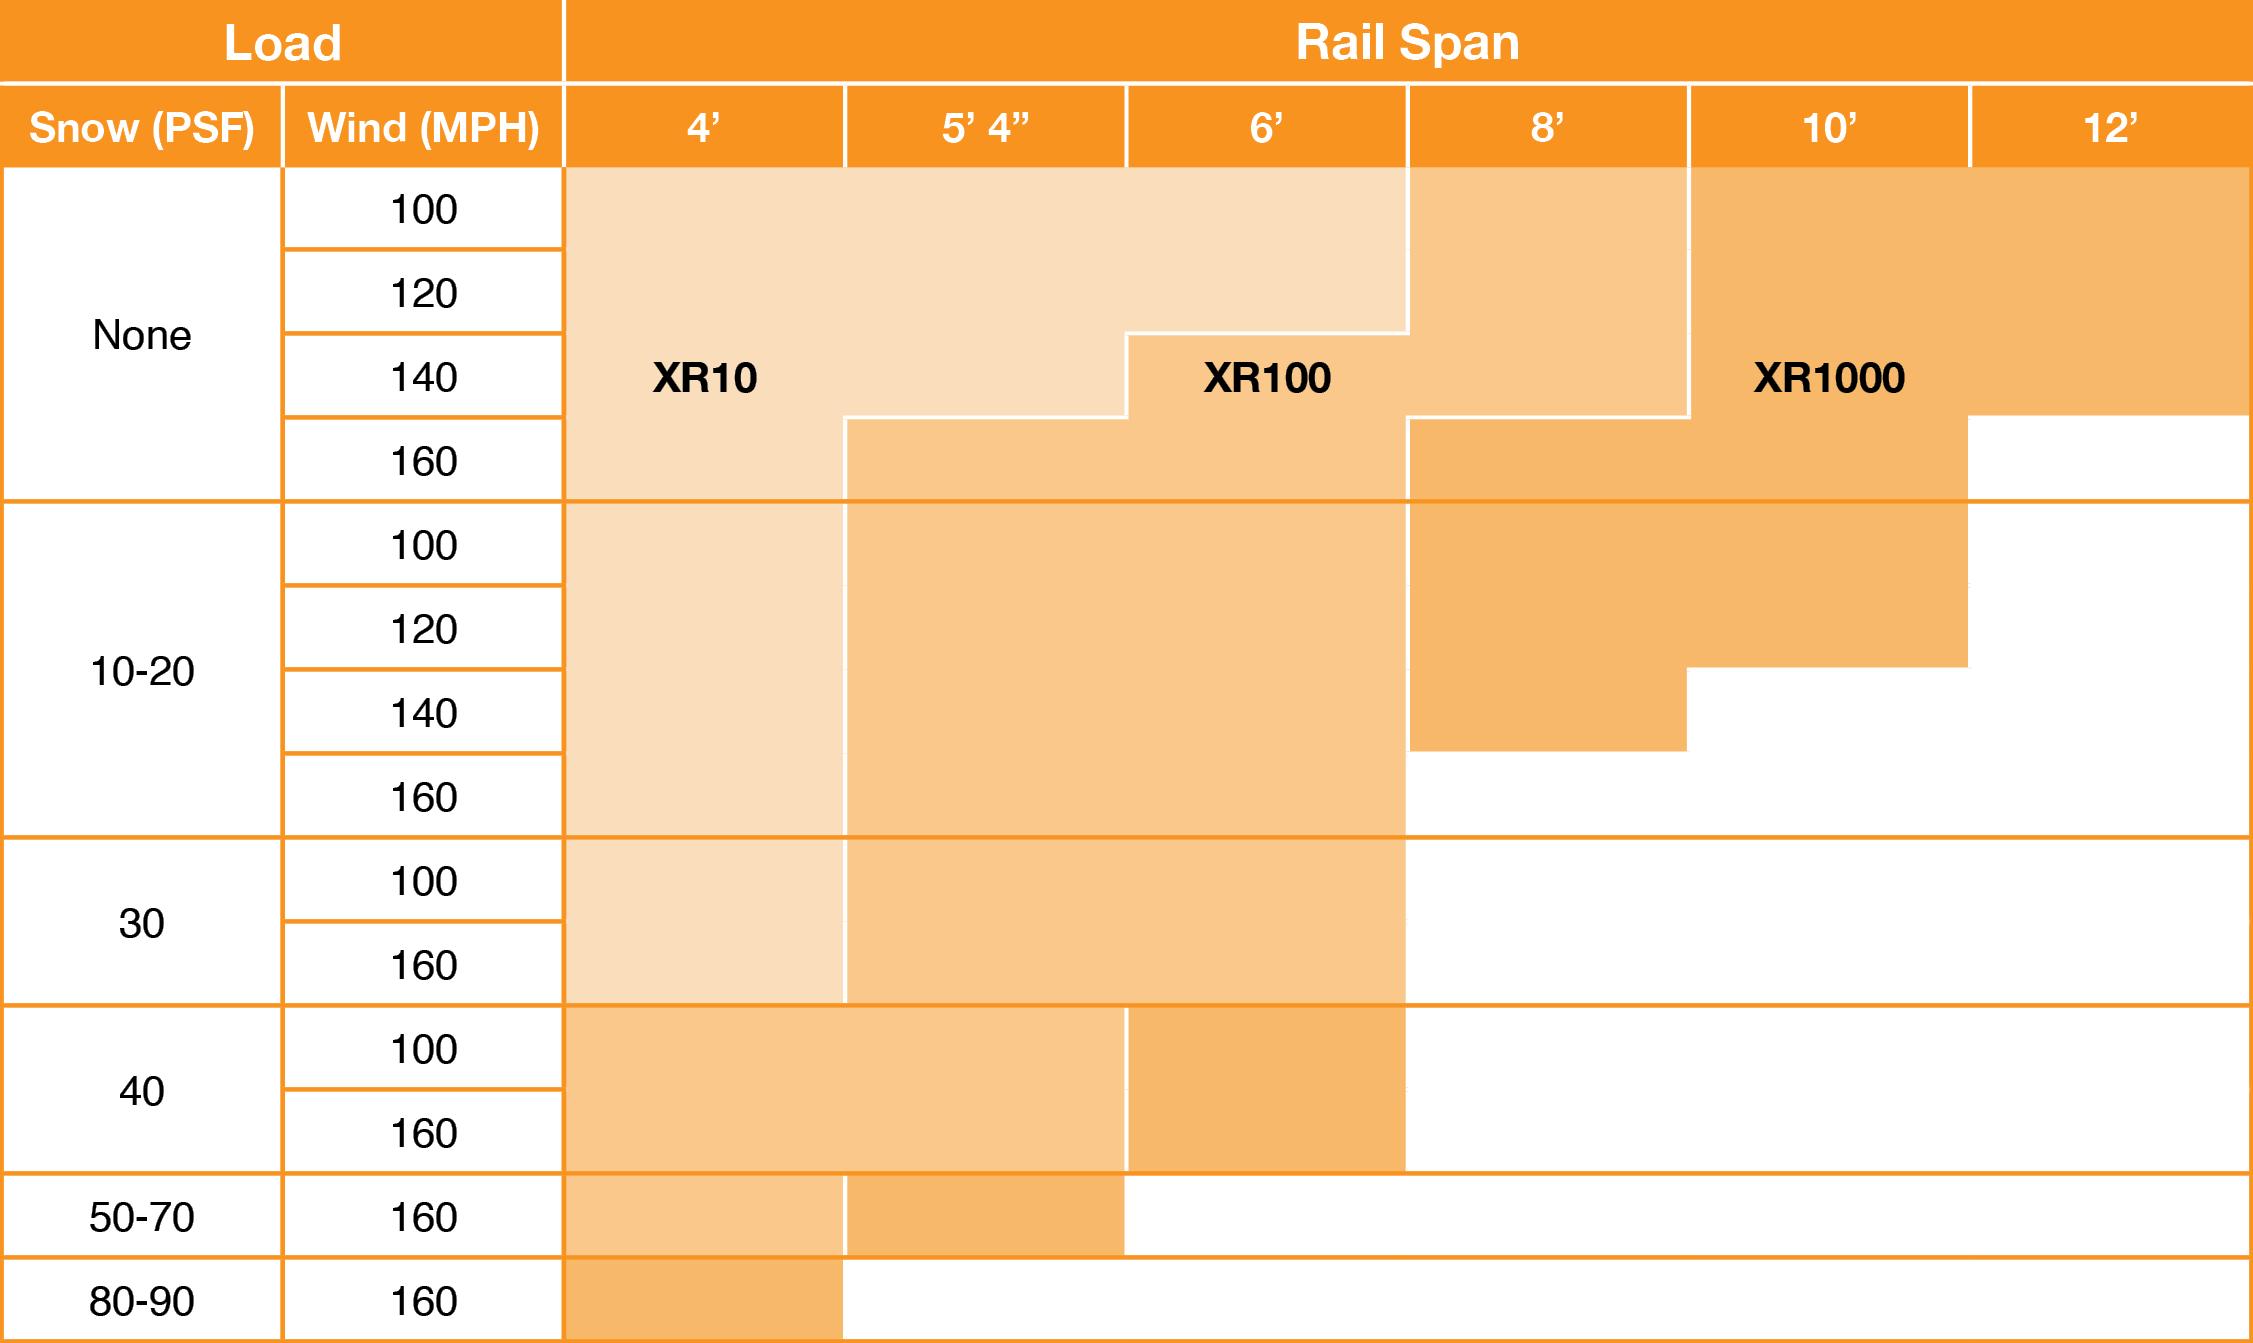 IronRidge XR Rails Span